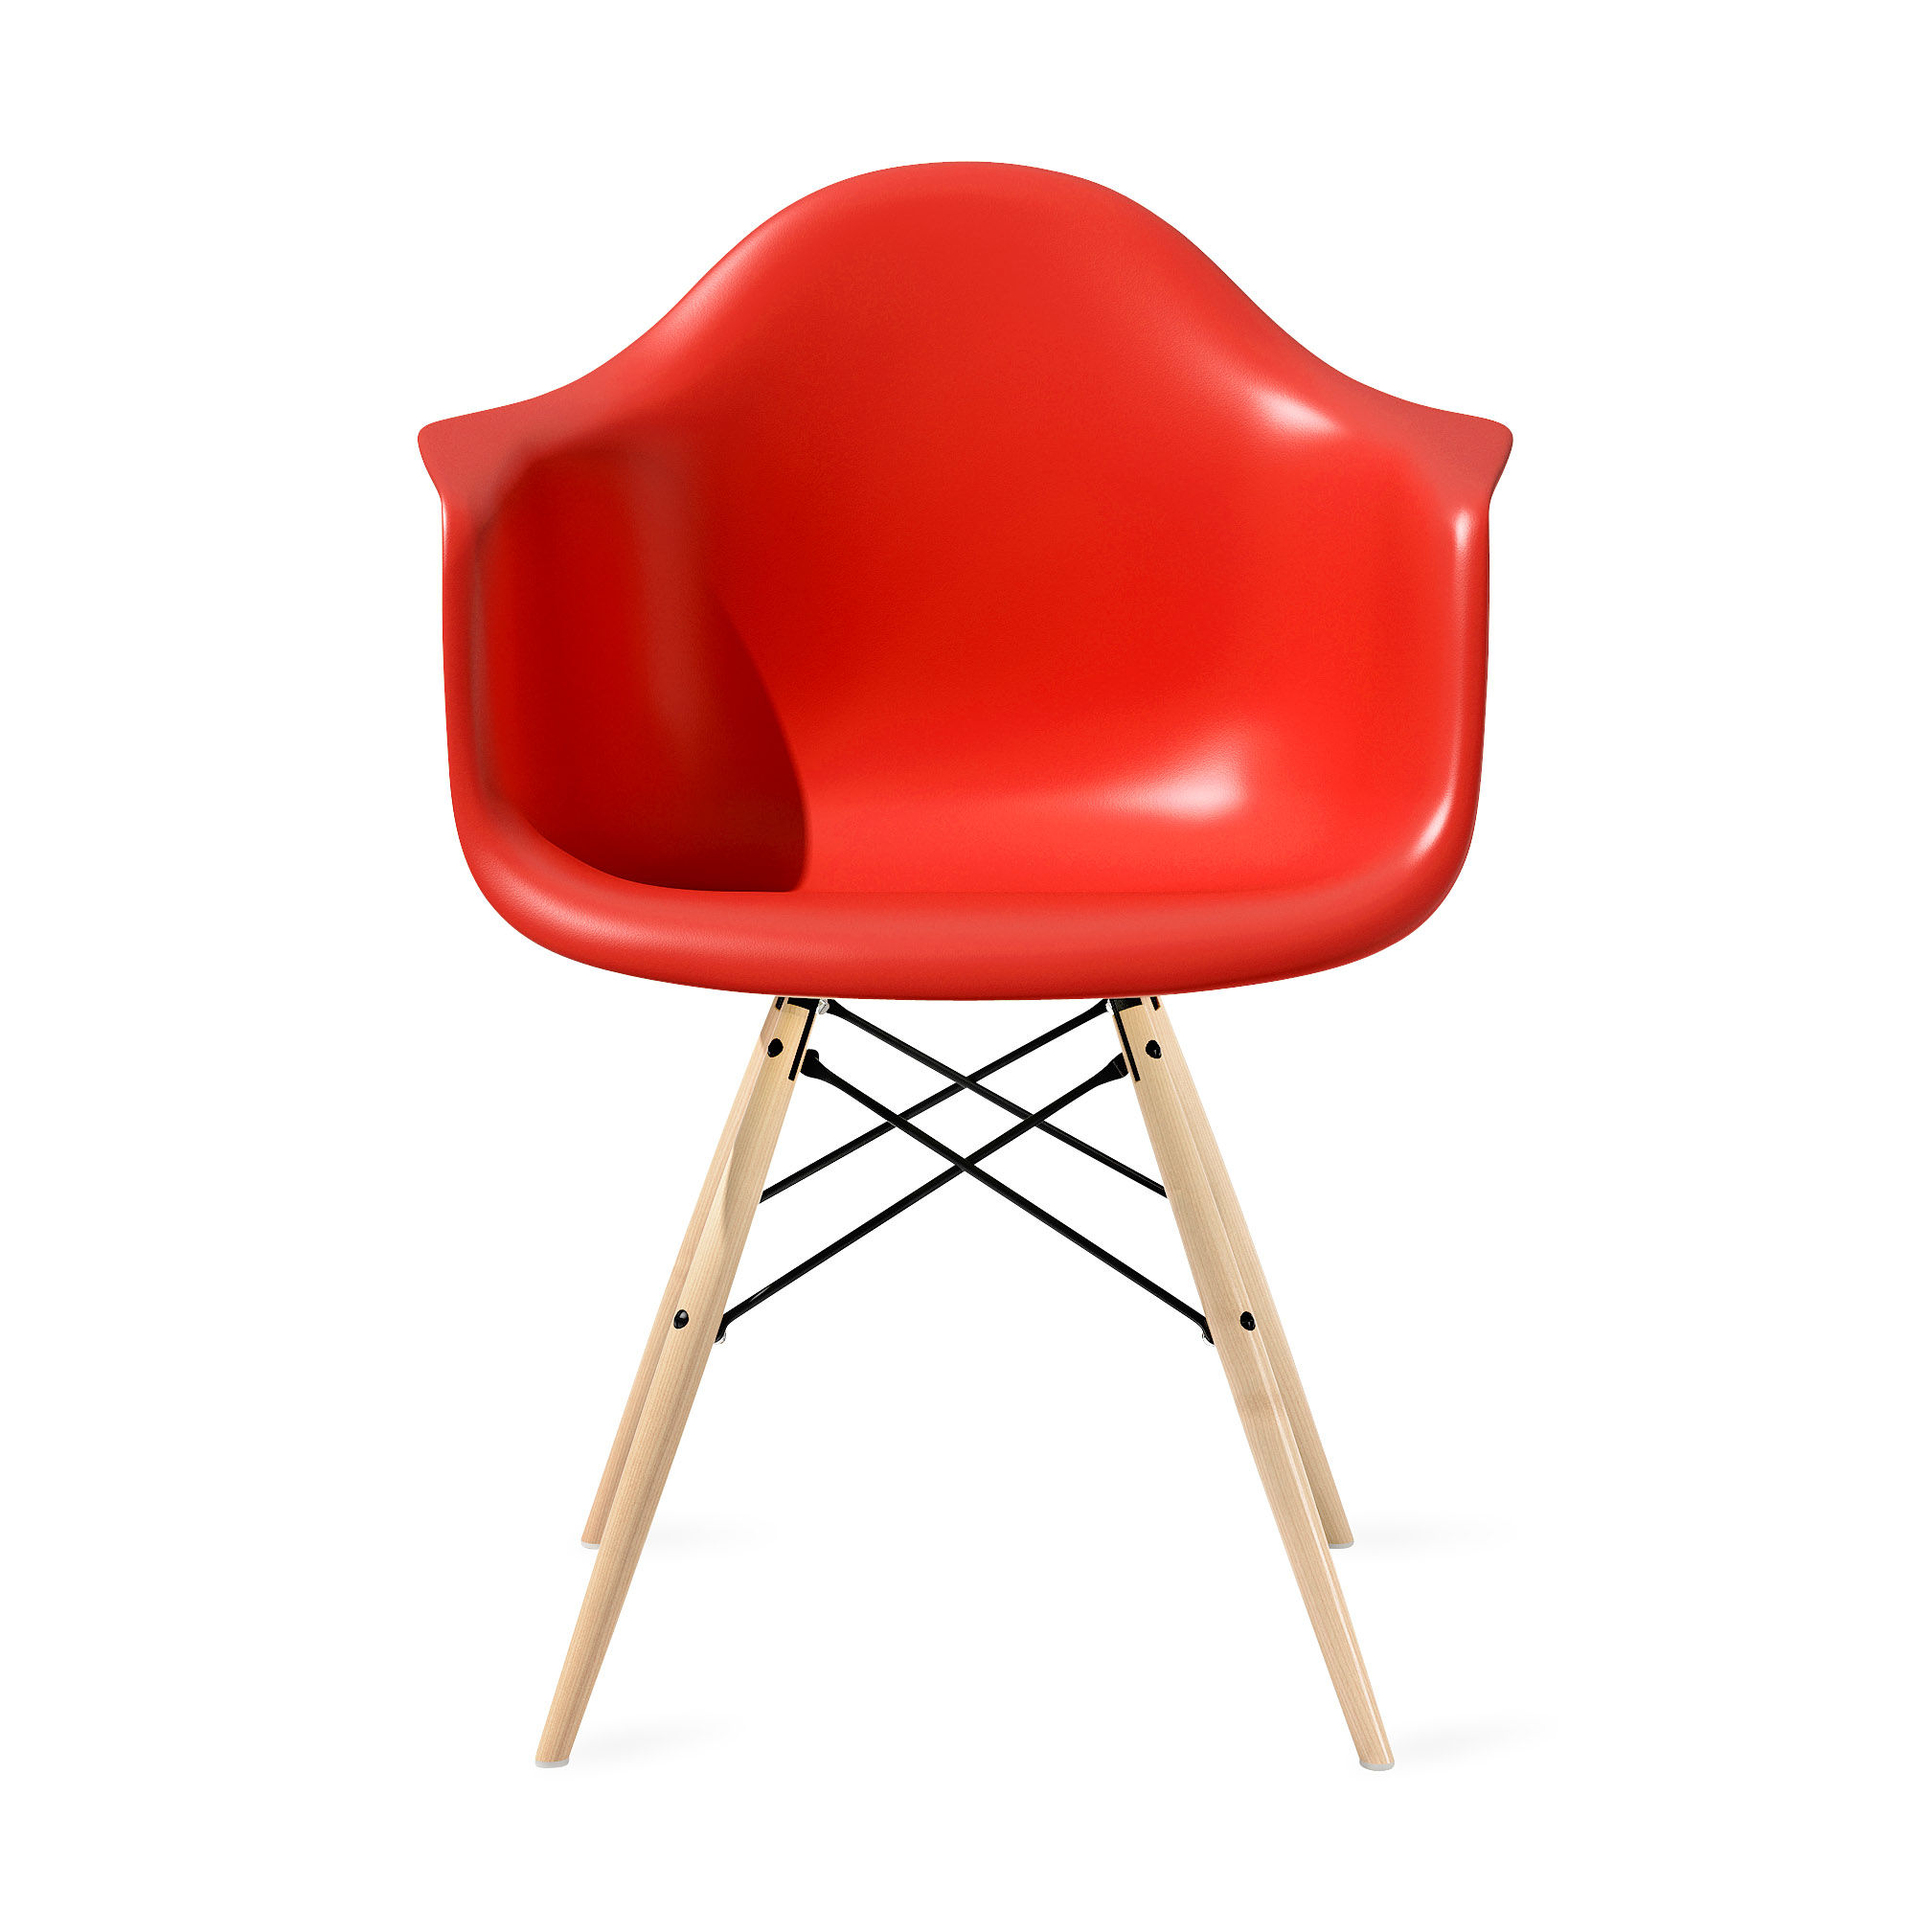 Eames® Molded Plastic Armchair with Dowel-Leg Base (DAW) | MoMA